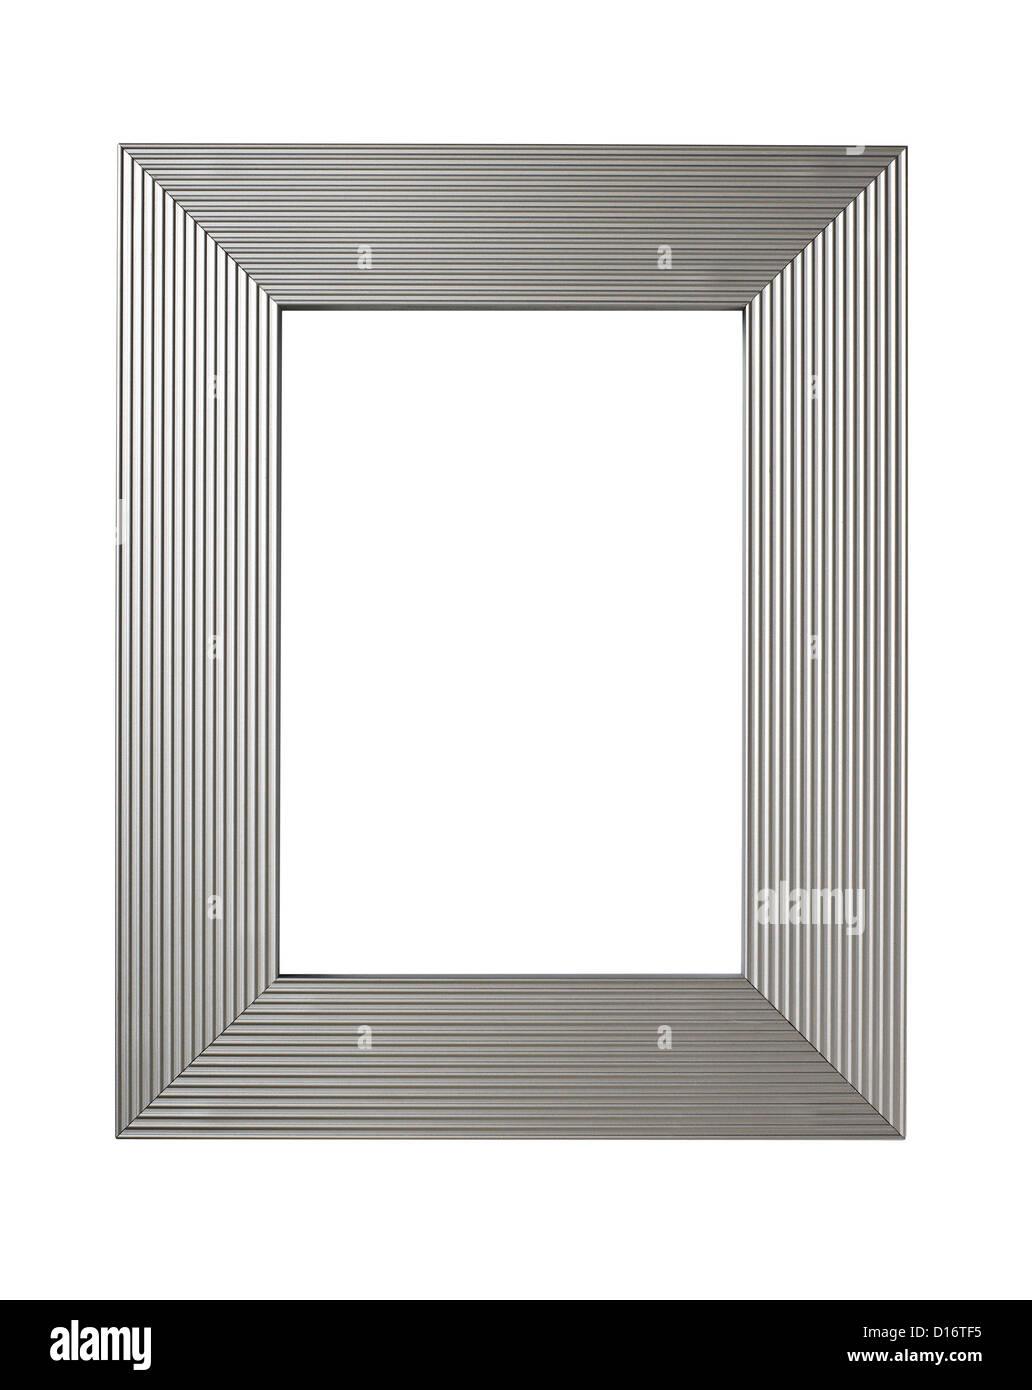 Silber Bilderrahmen Metall-finish Stockfoto, Bild: 52396713 - Alamy